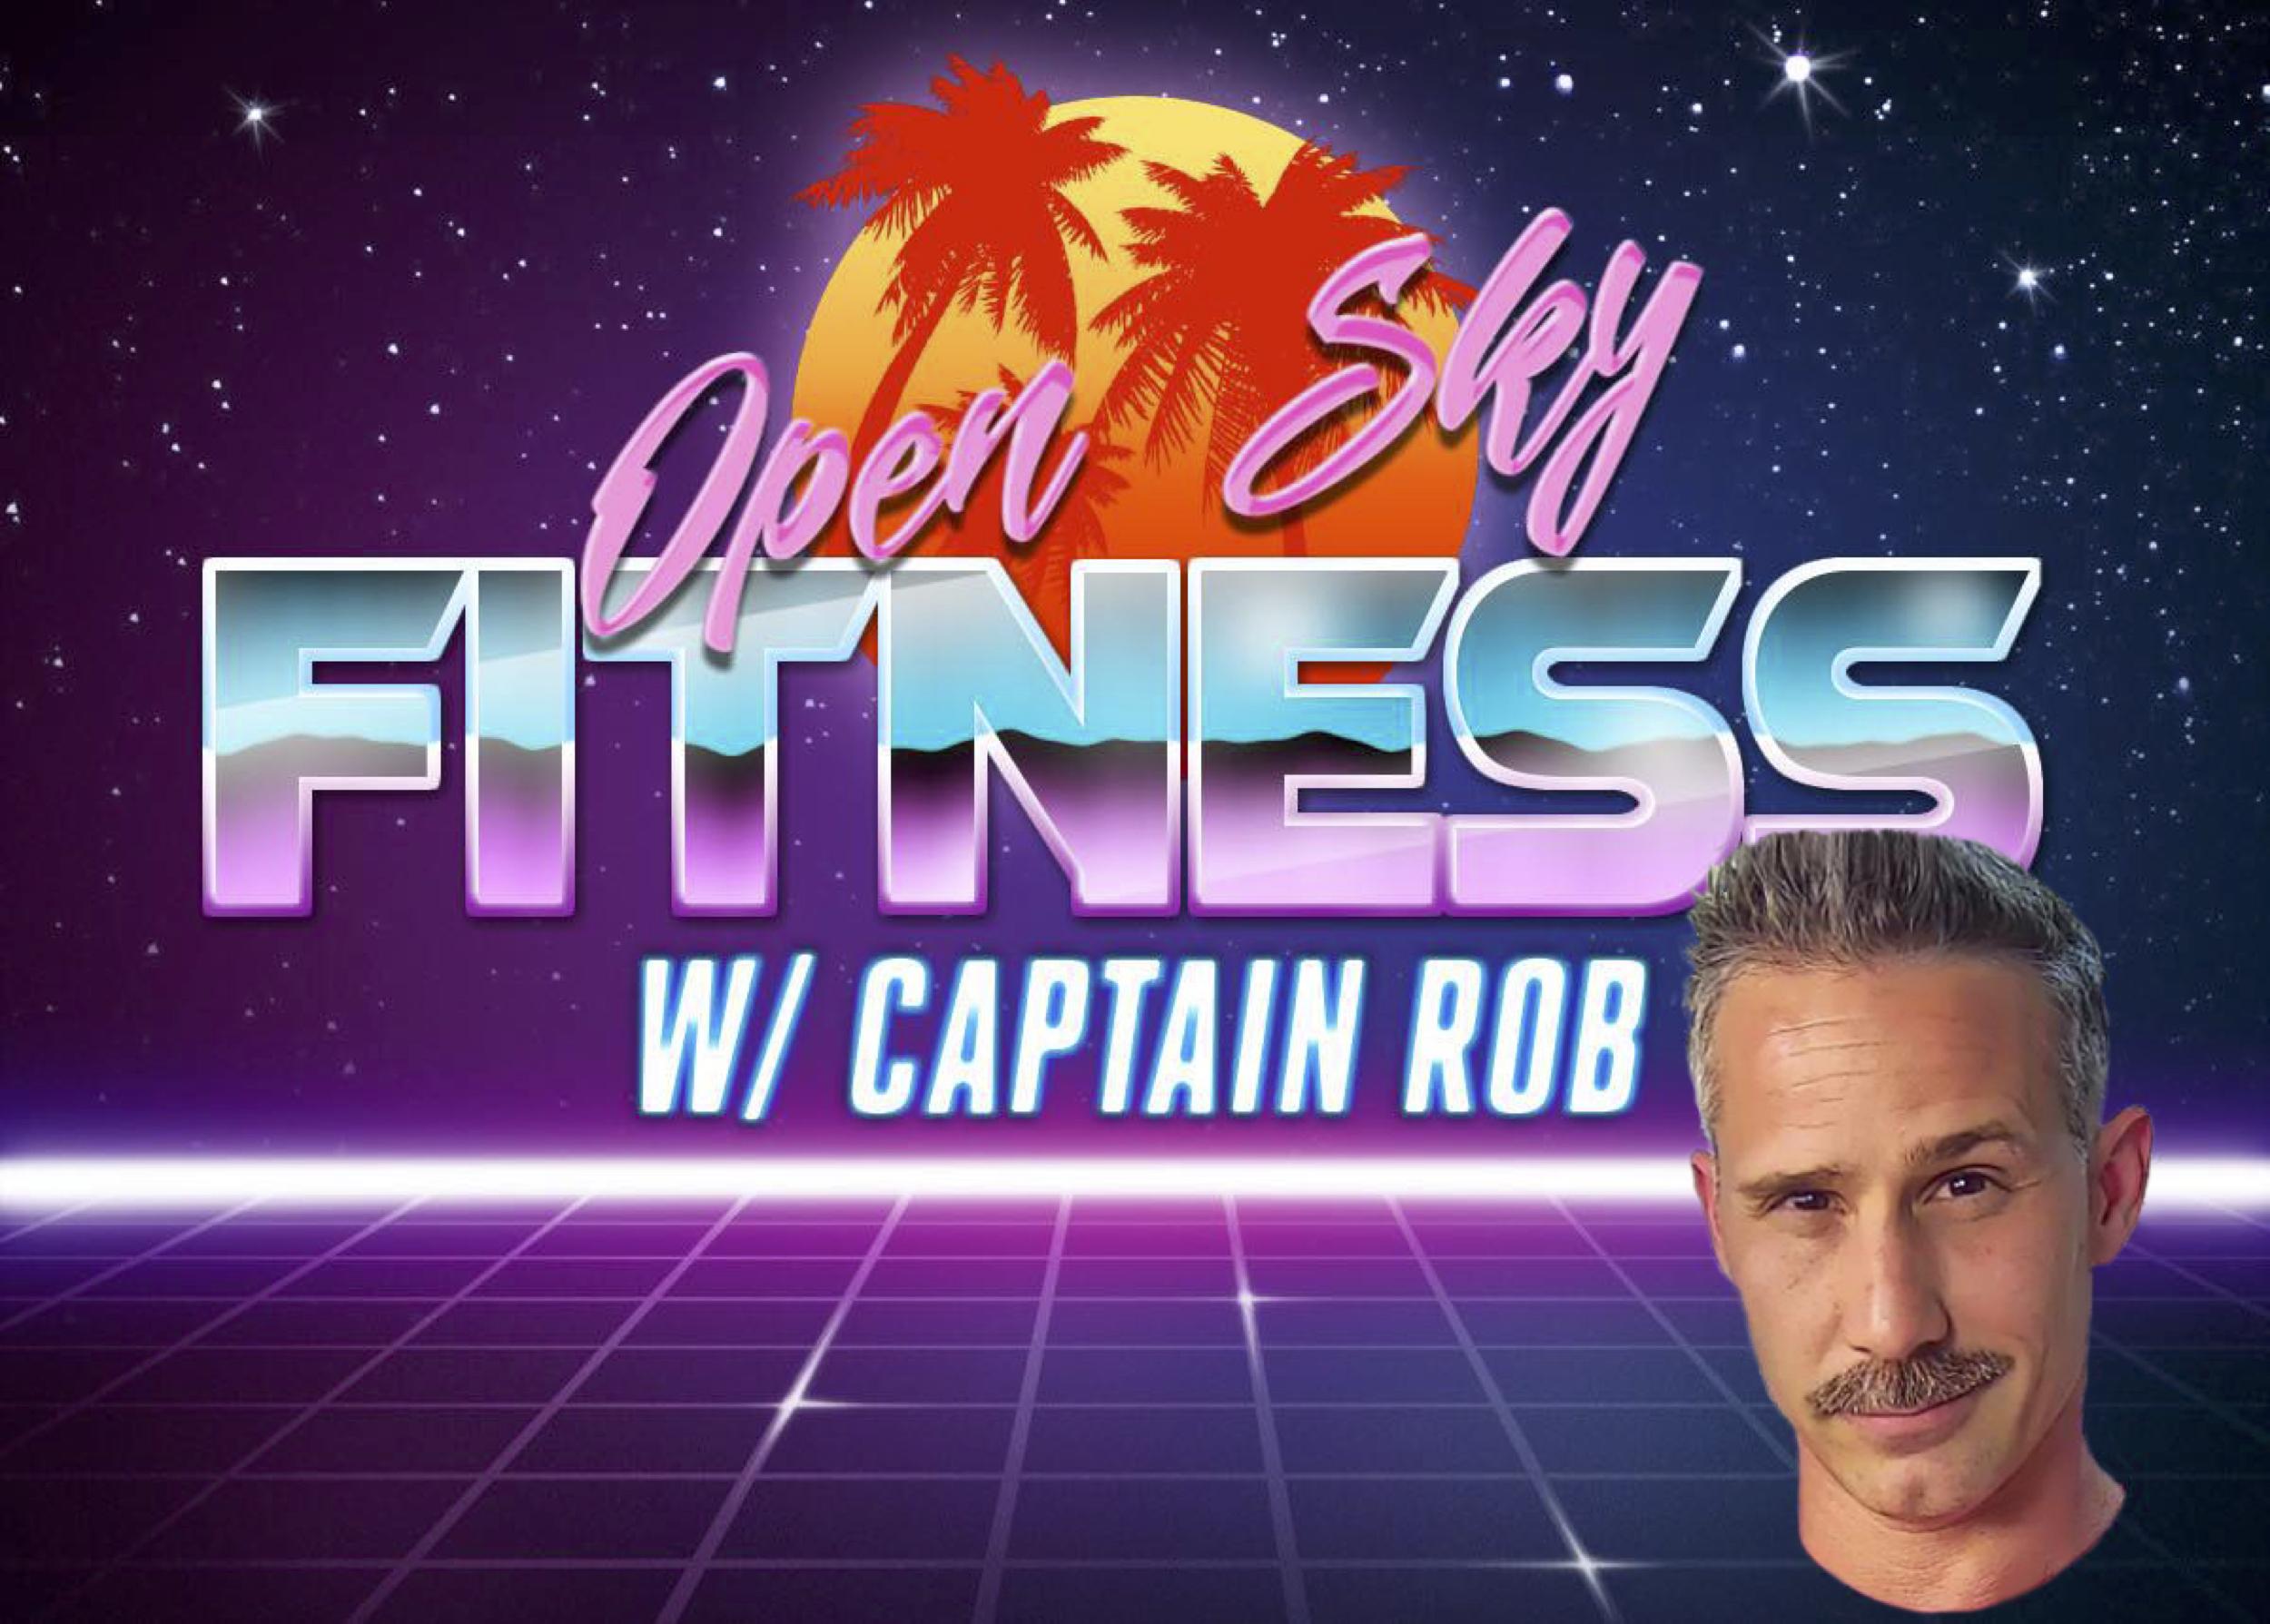 Rob-Sky-fitness (1)